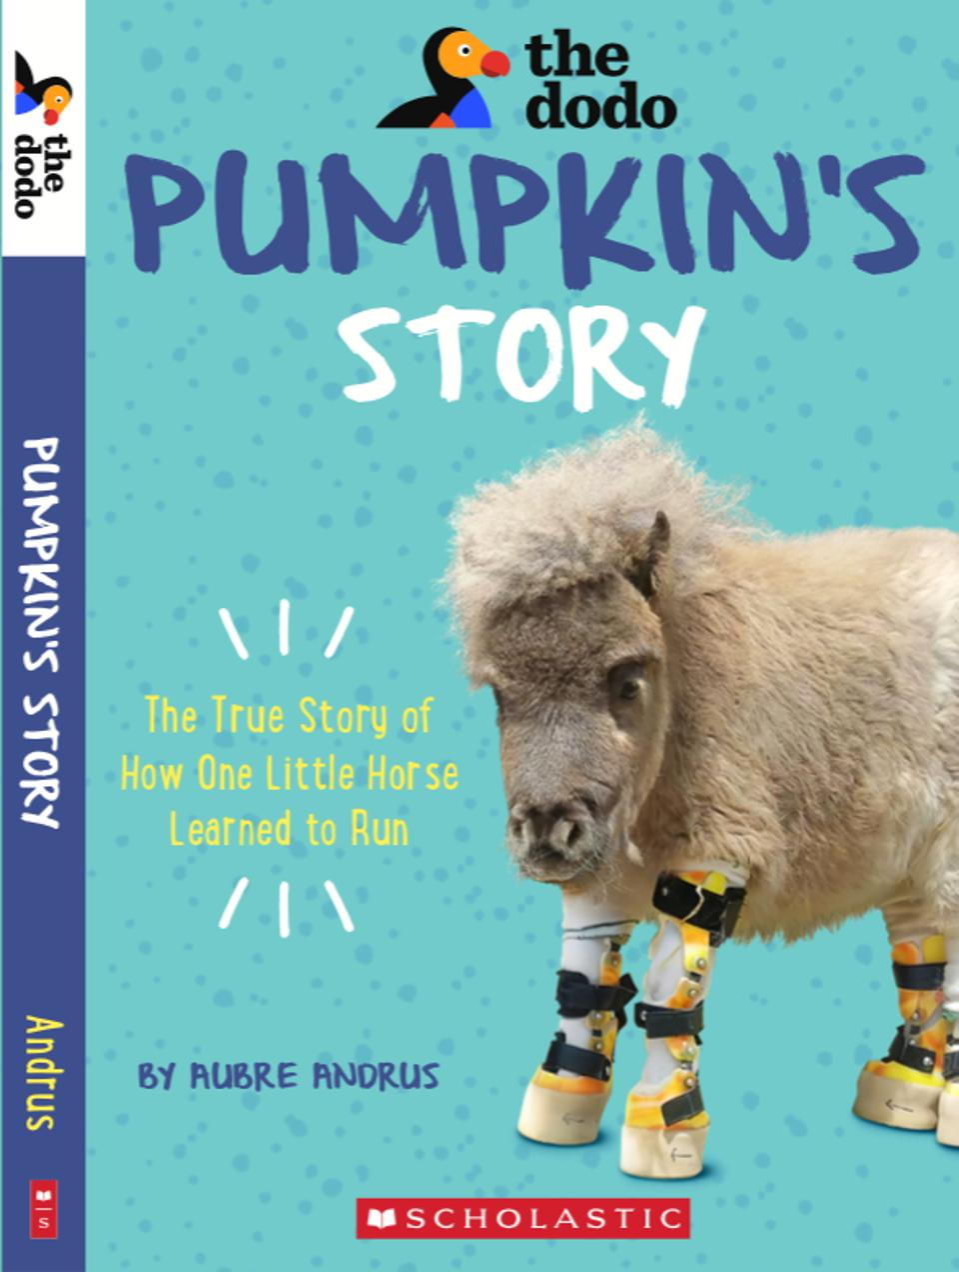 'Pumpkins Story' cover